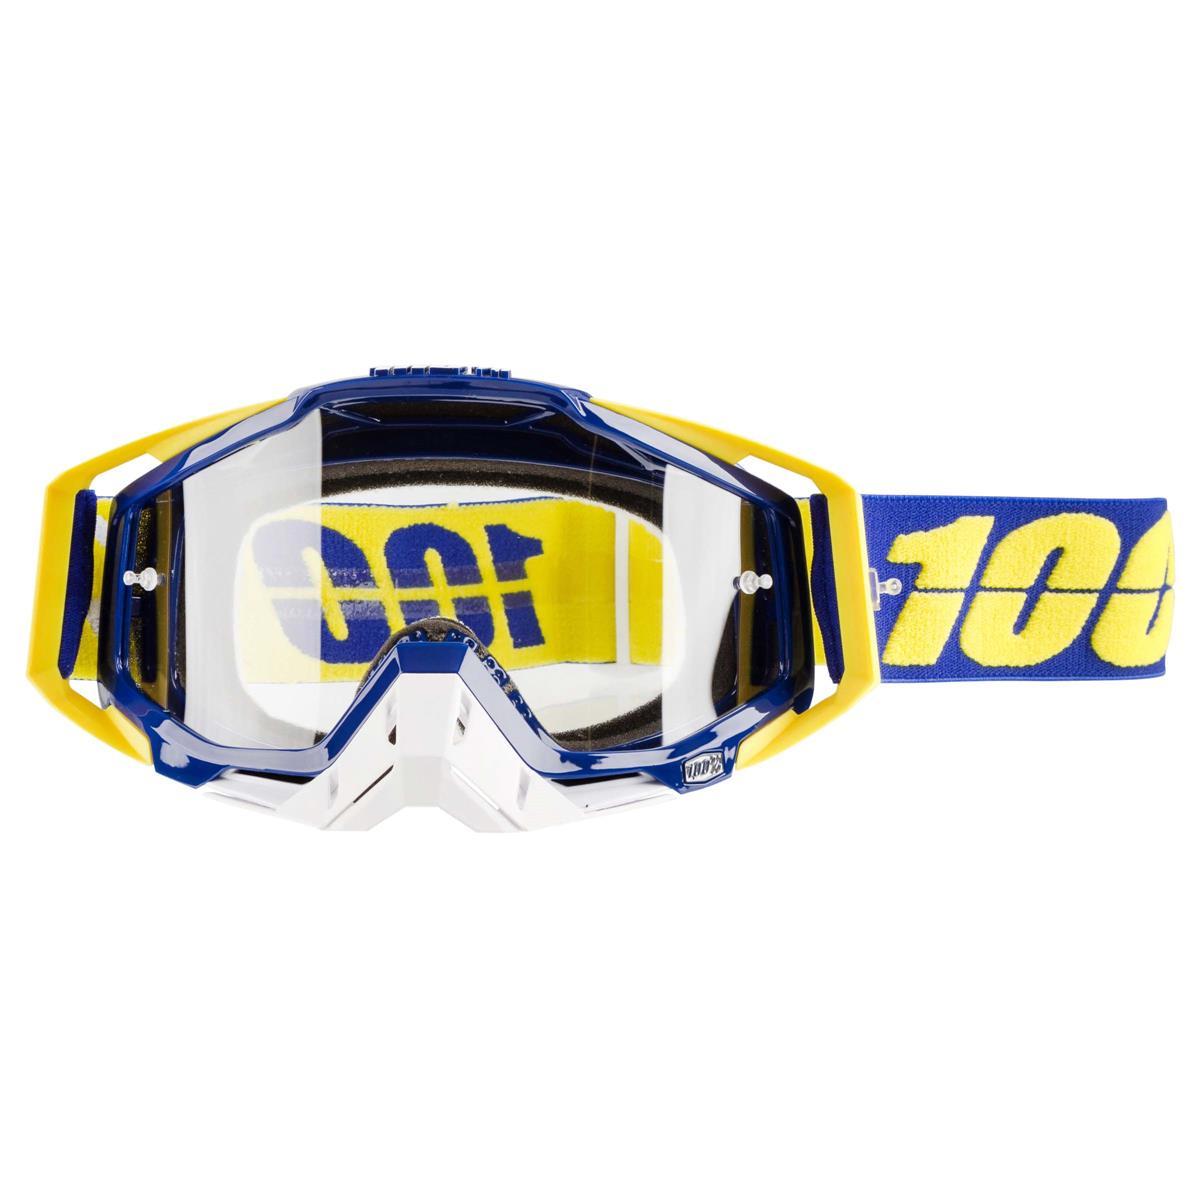 100% Crossbrille The Racecraft Lindstrom - Klar Anti-Fog